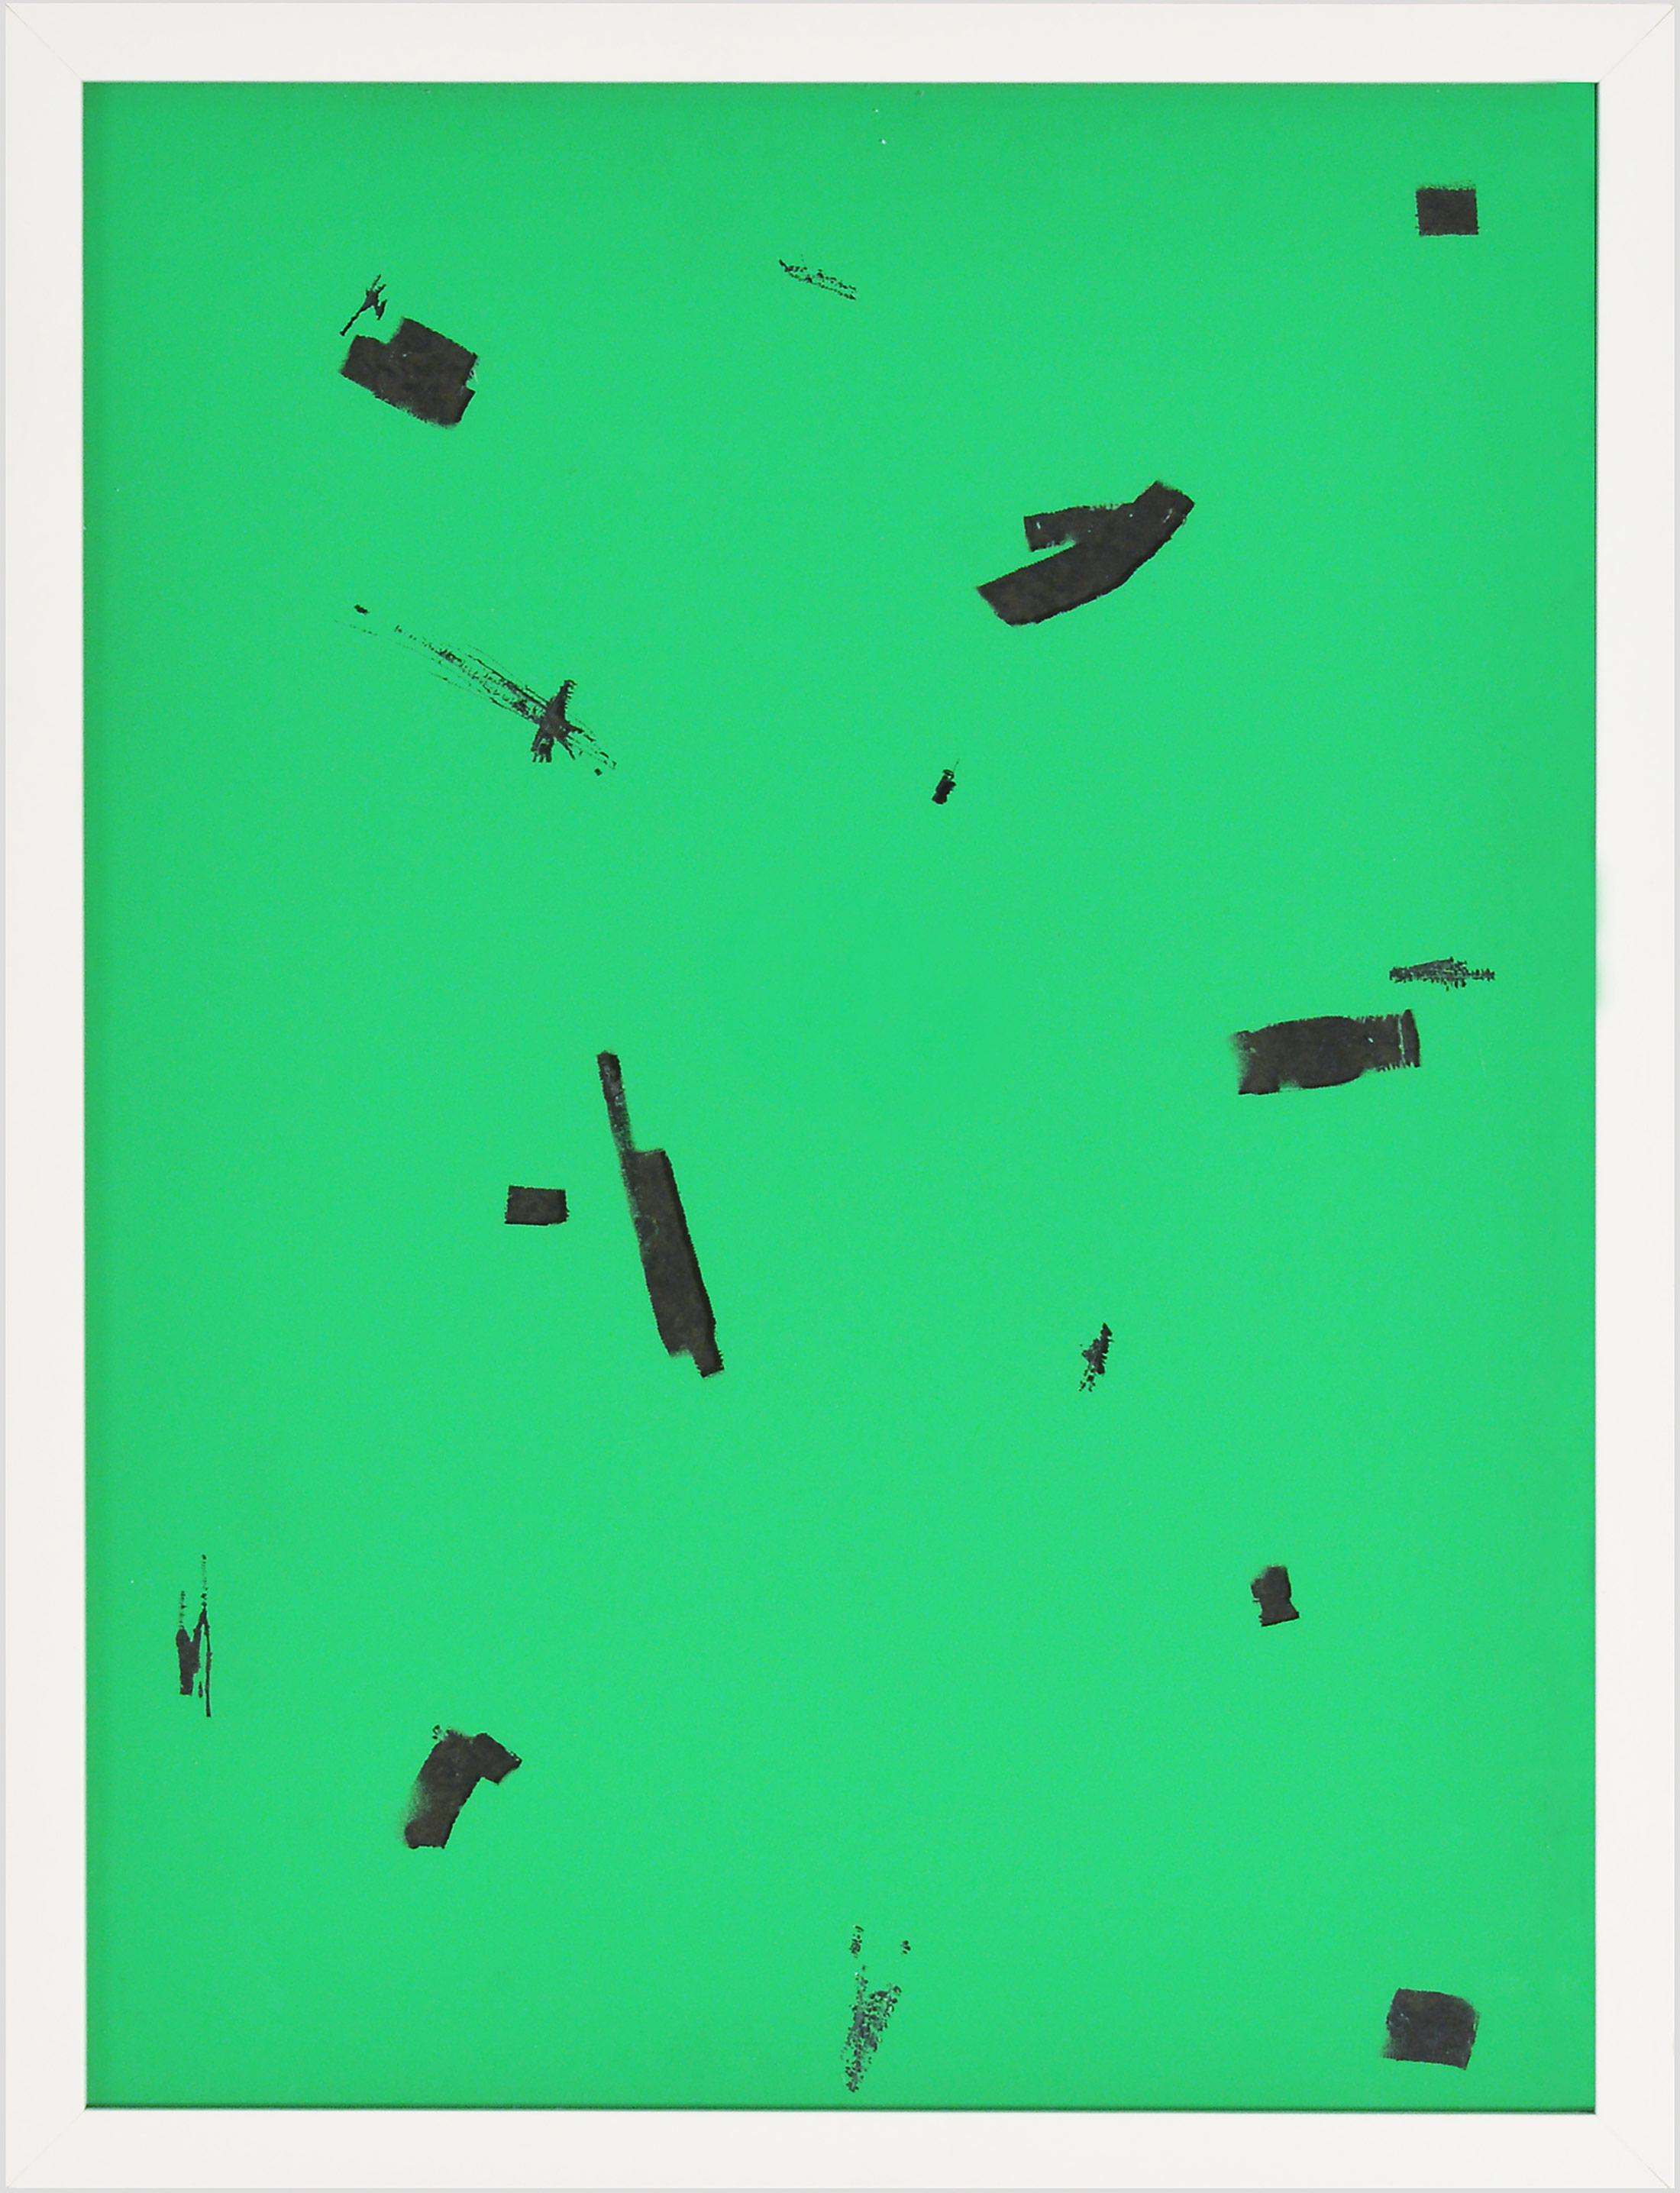 emaneul ehgartner, contemporary artist, varnish on glass, green, viewing room